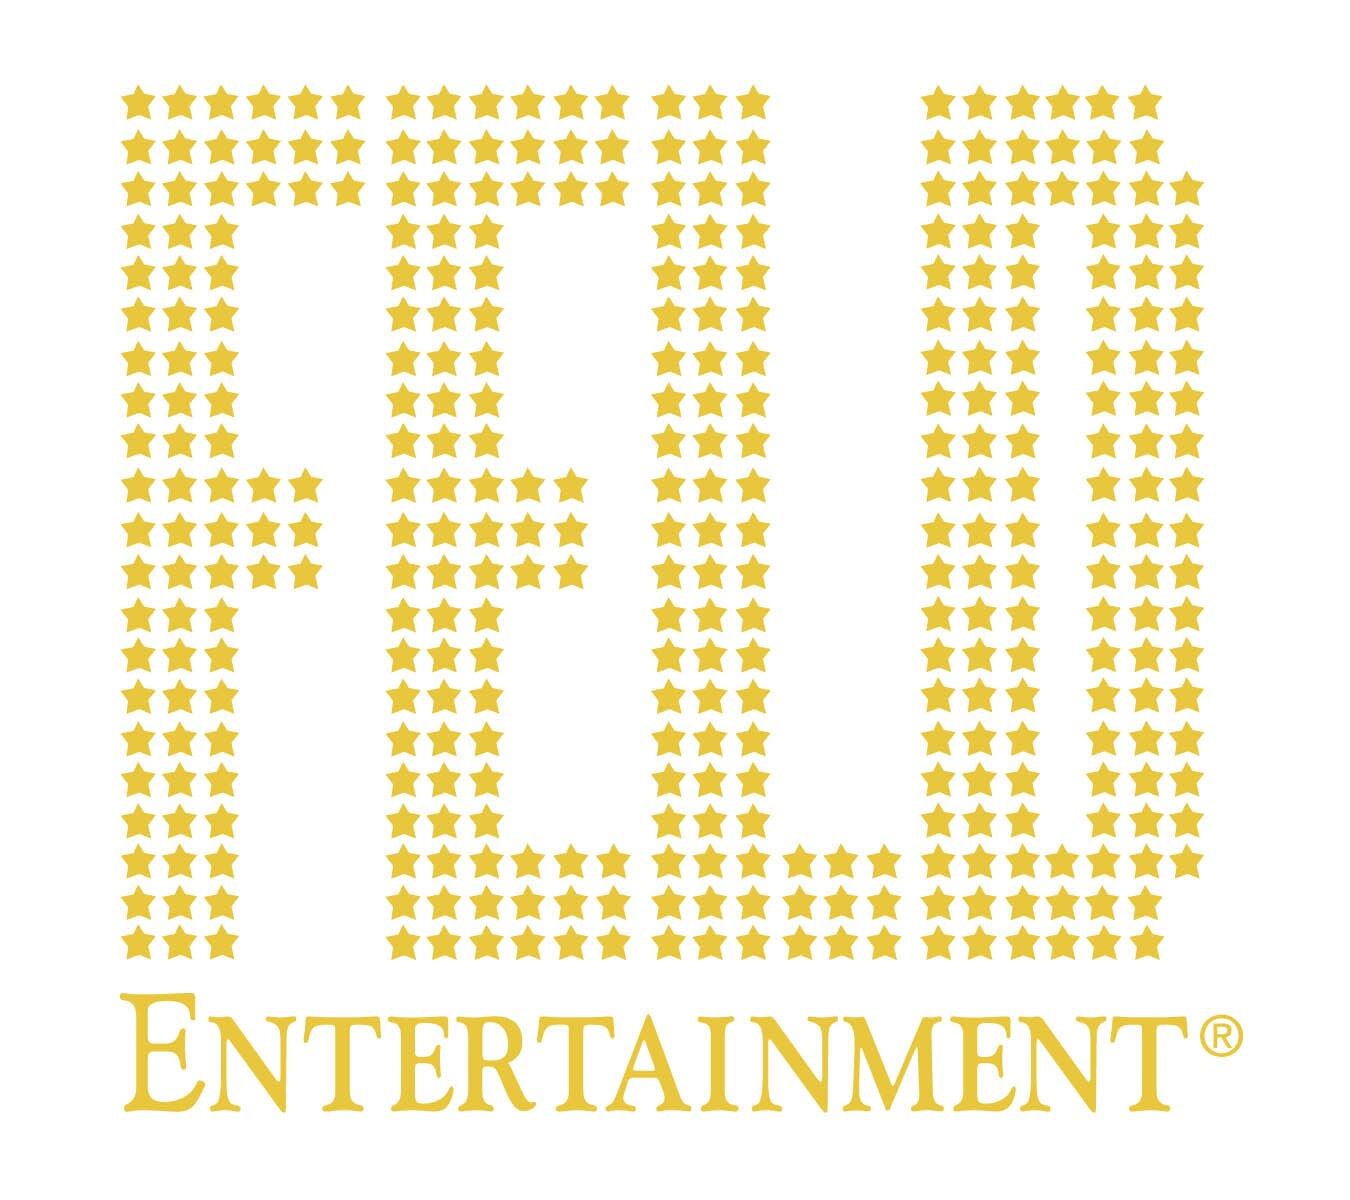 feld entertainment logo